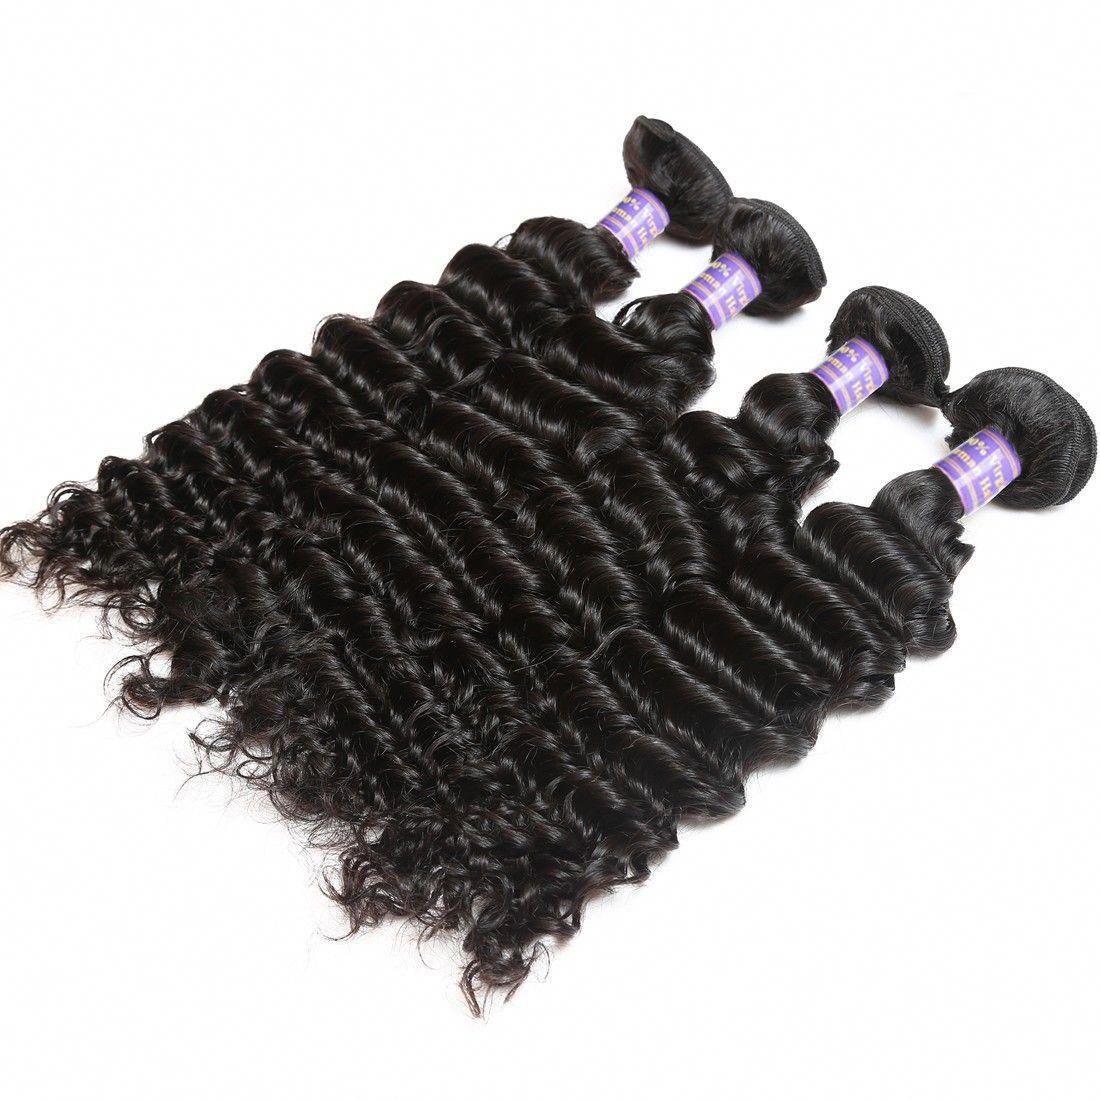 Black hair styles. blackhairstyleswithweave Deep wave